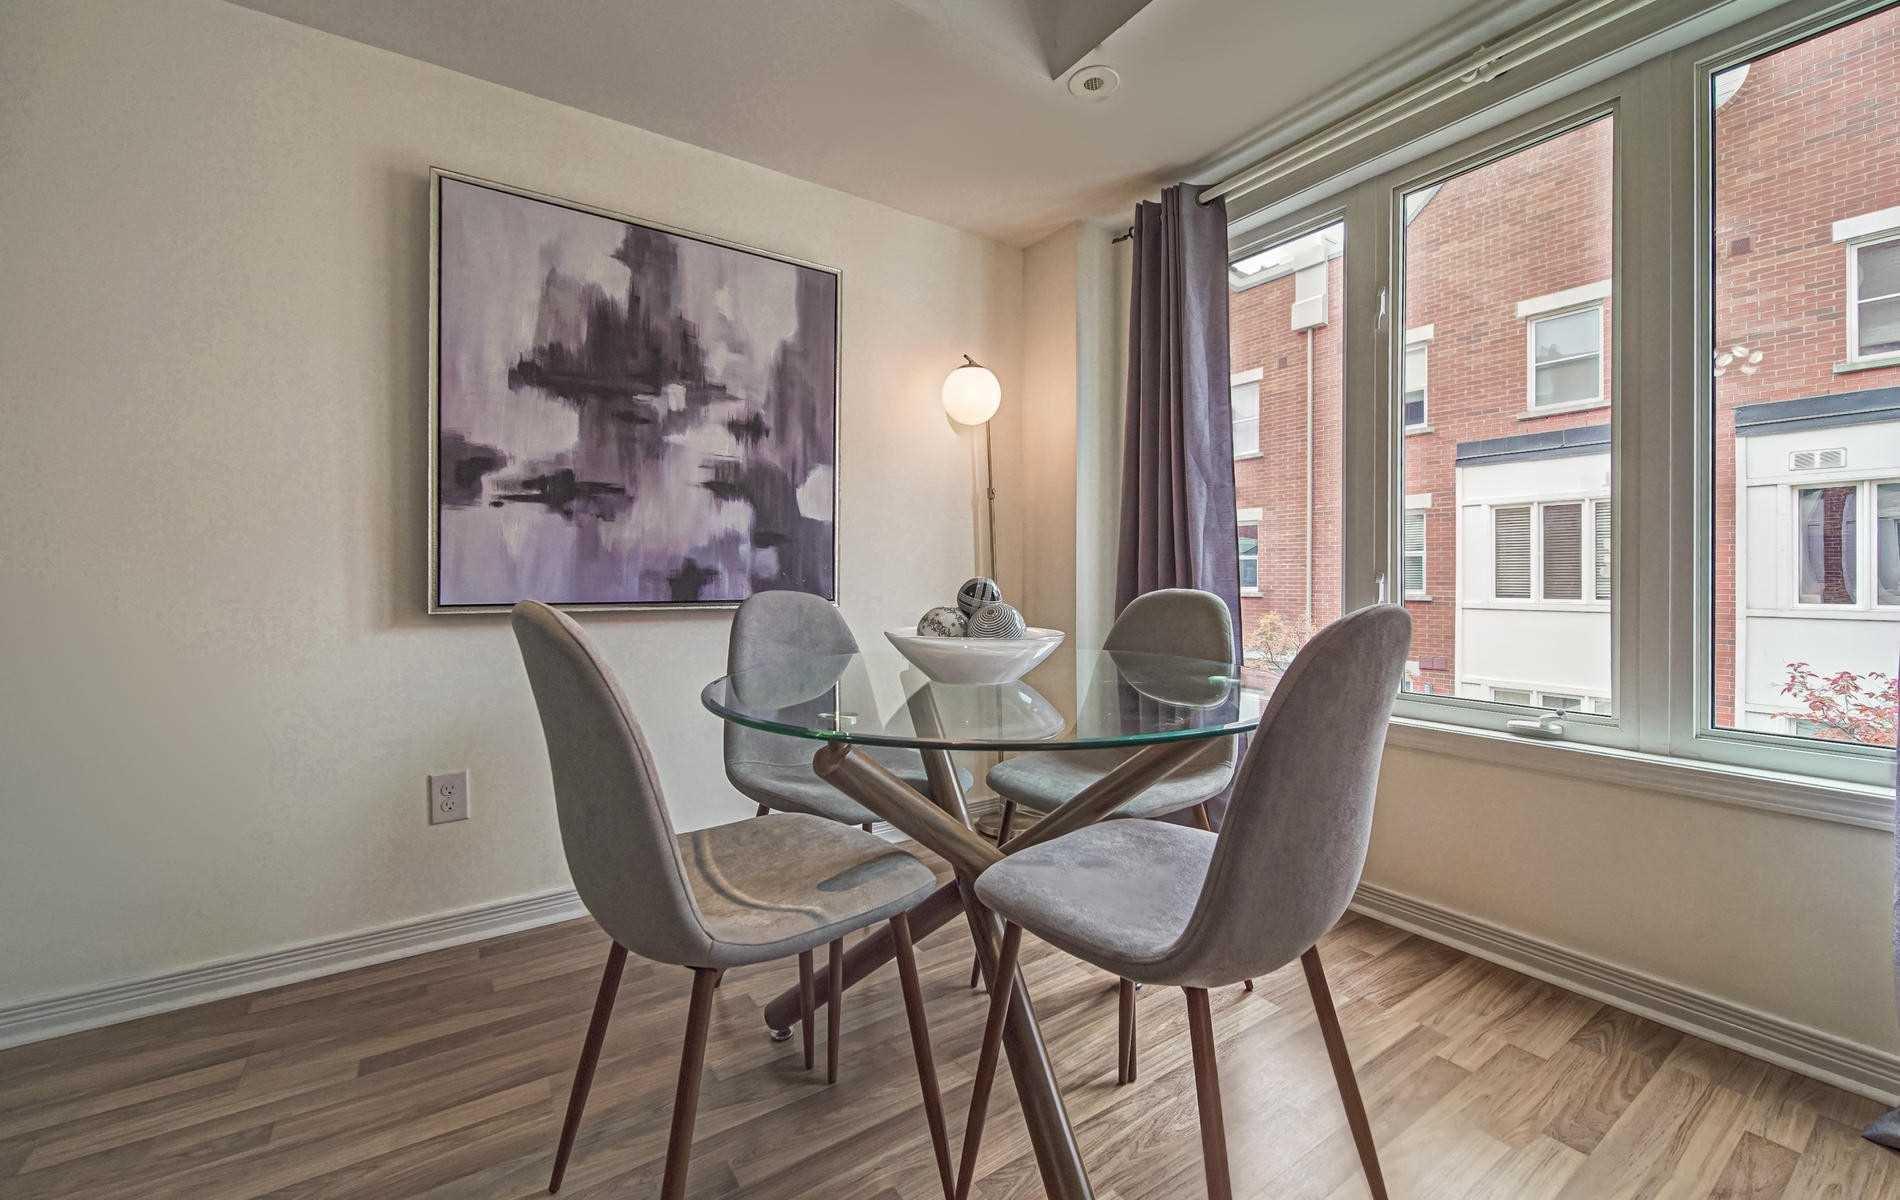 Photo 5: Photos: 3 78 Munro Street in Toronto: South Riverdale Condo for sale (Toronto E01)  : MLS®# E4615987